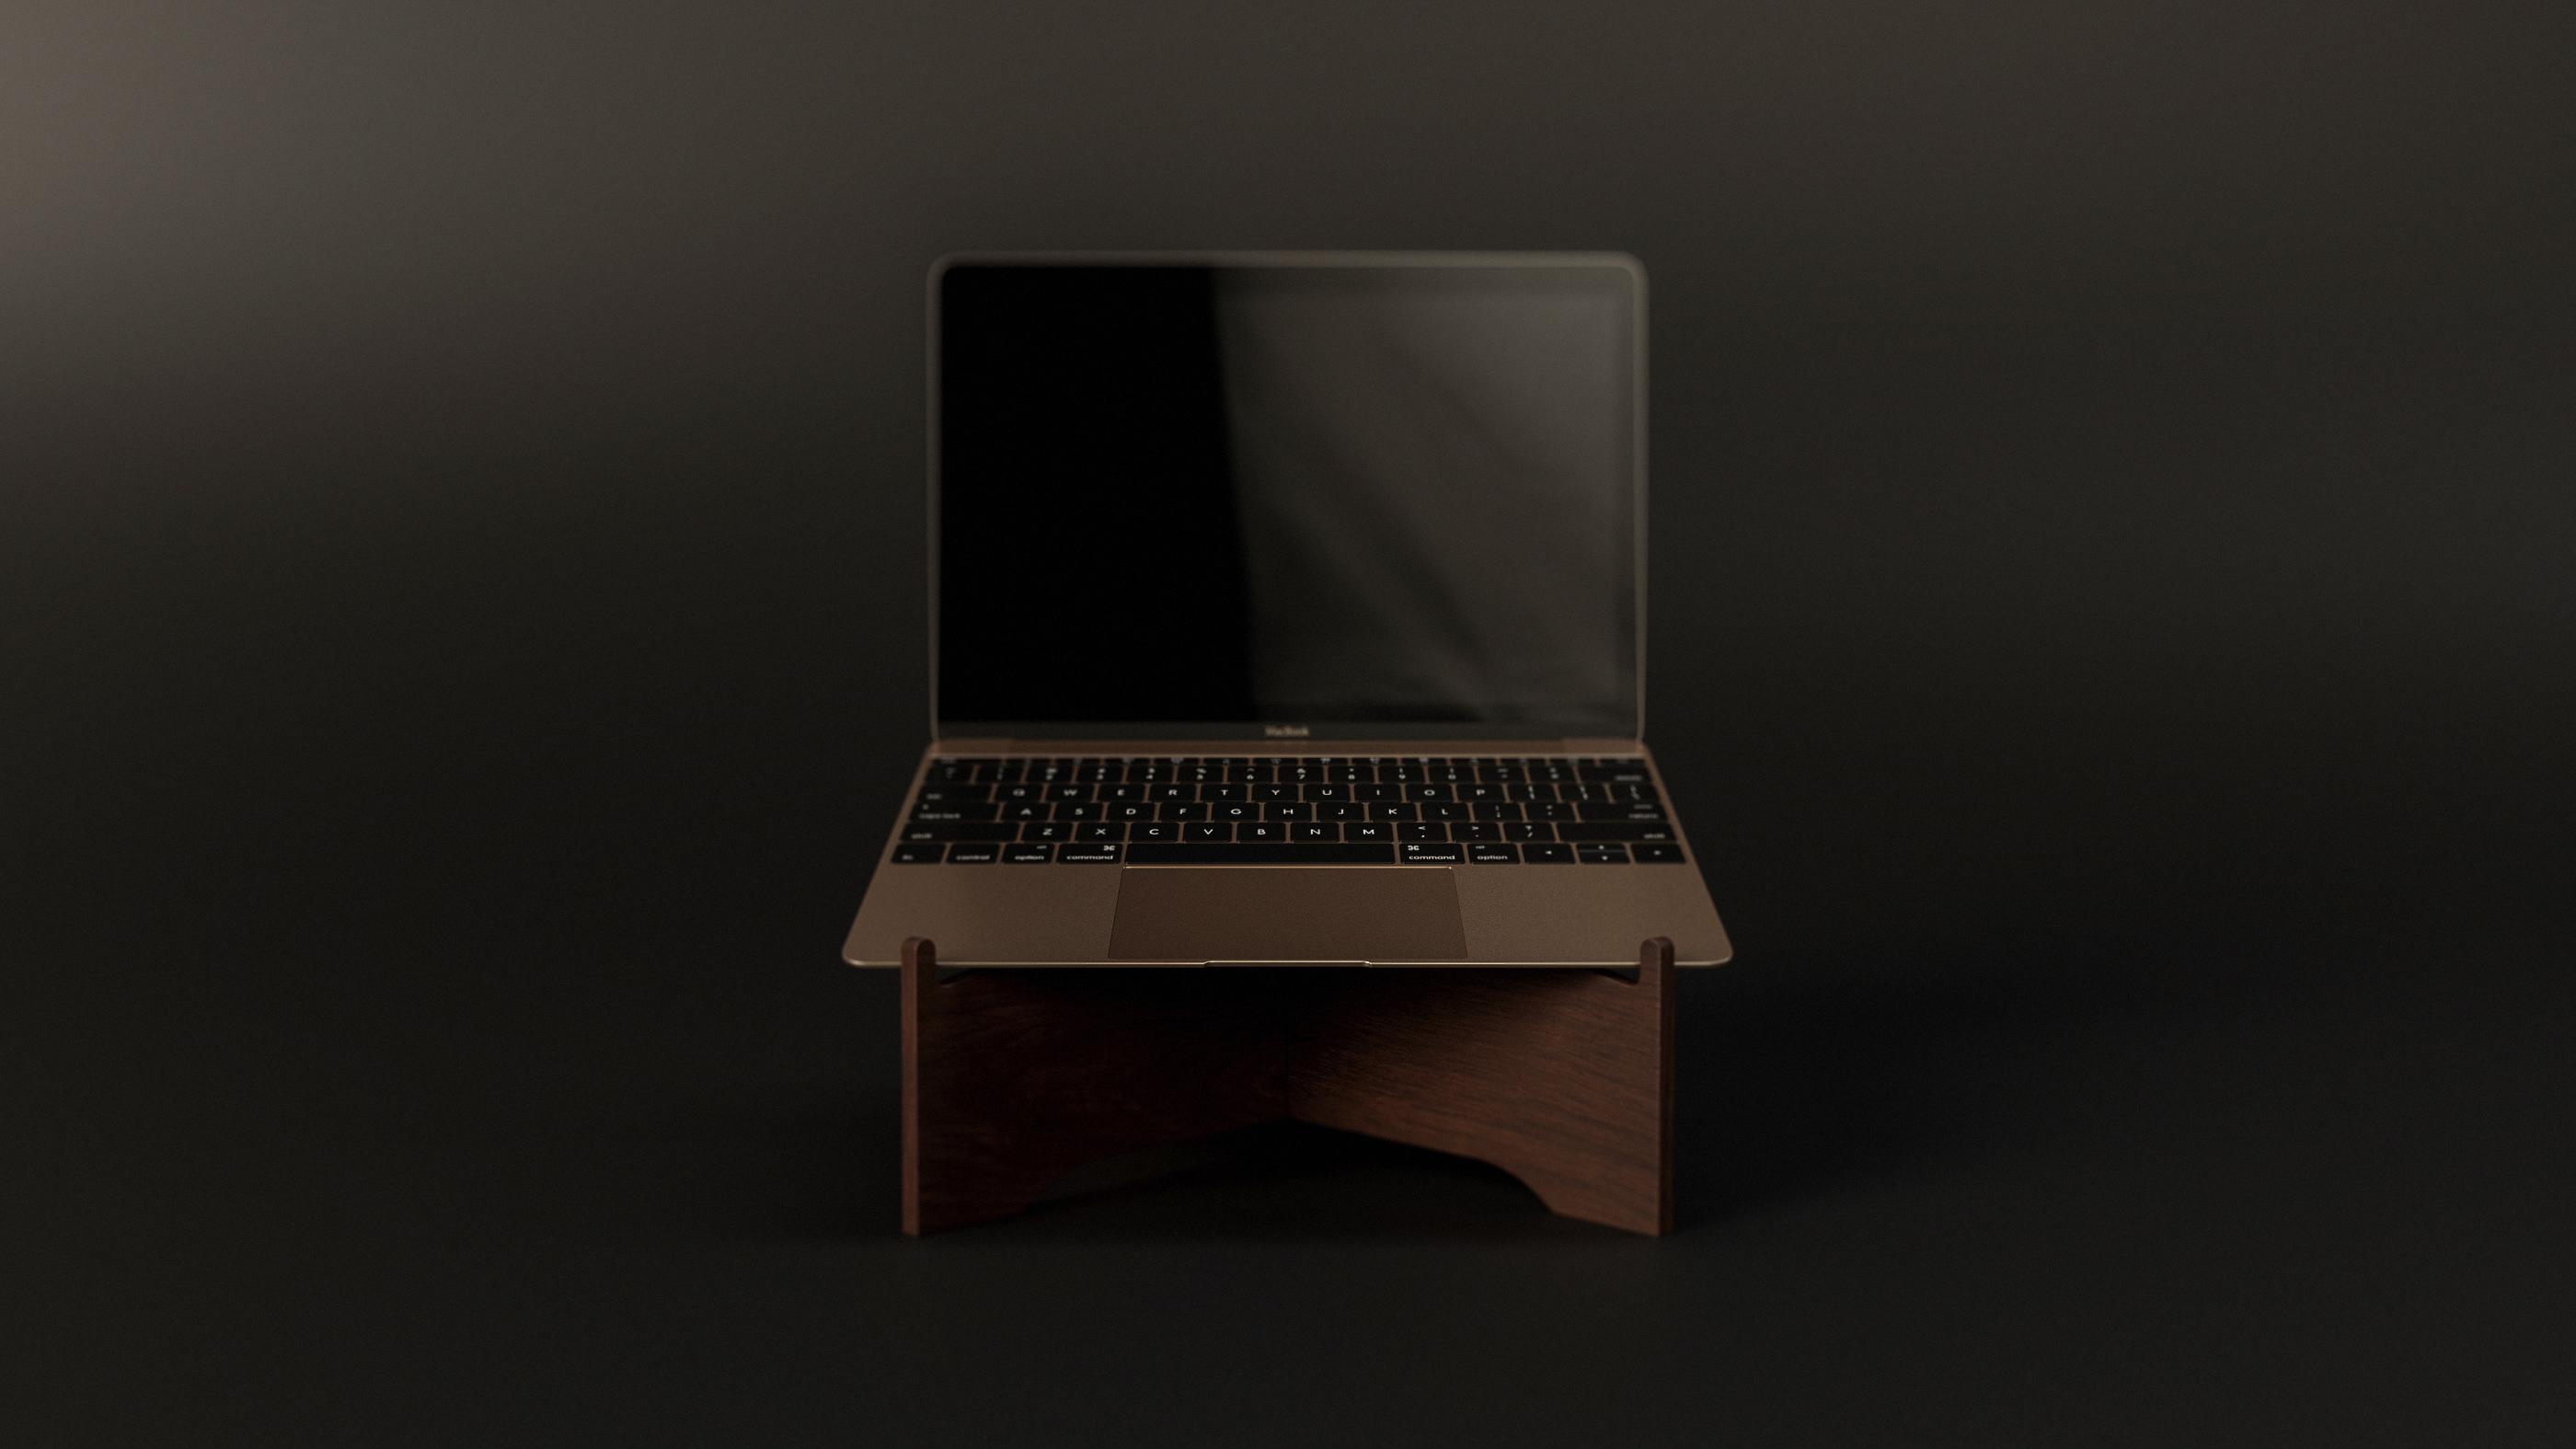 Macbook Stand - 1